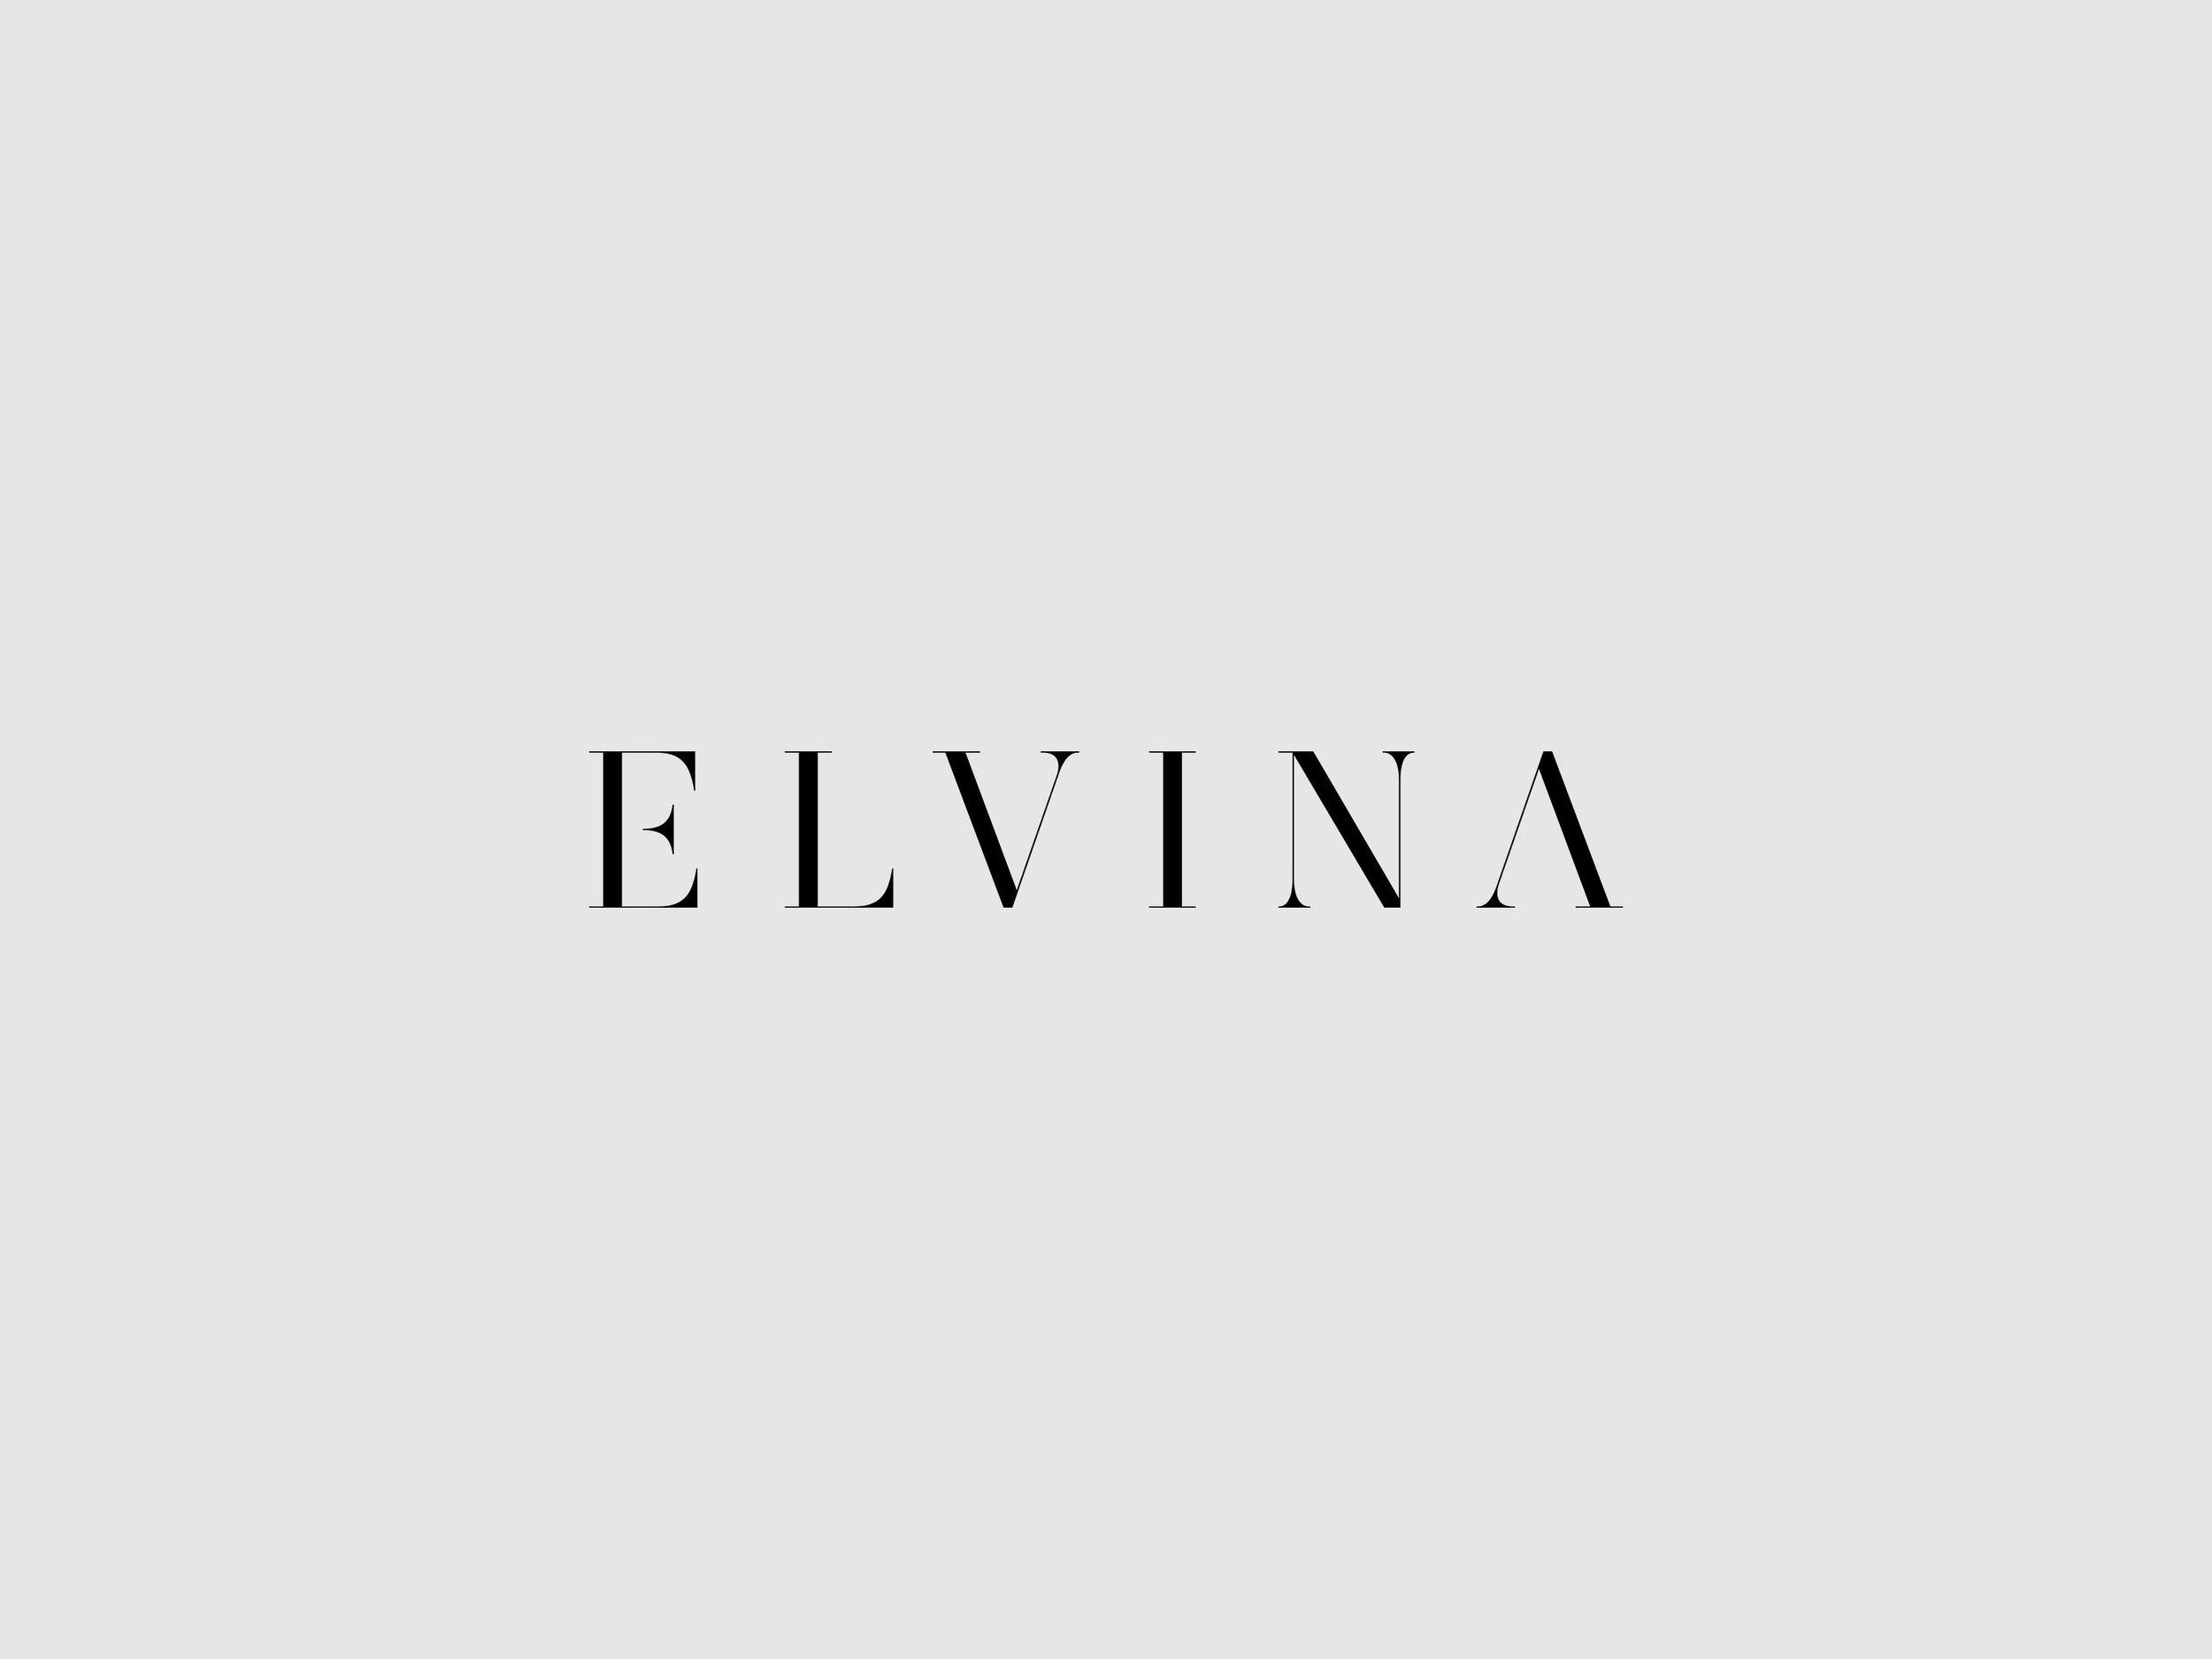 Elvina_Busness-Card_05.jpg